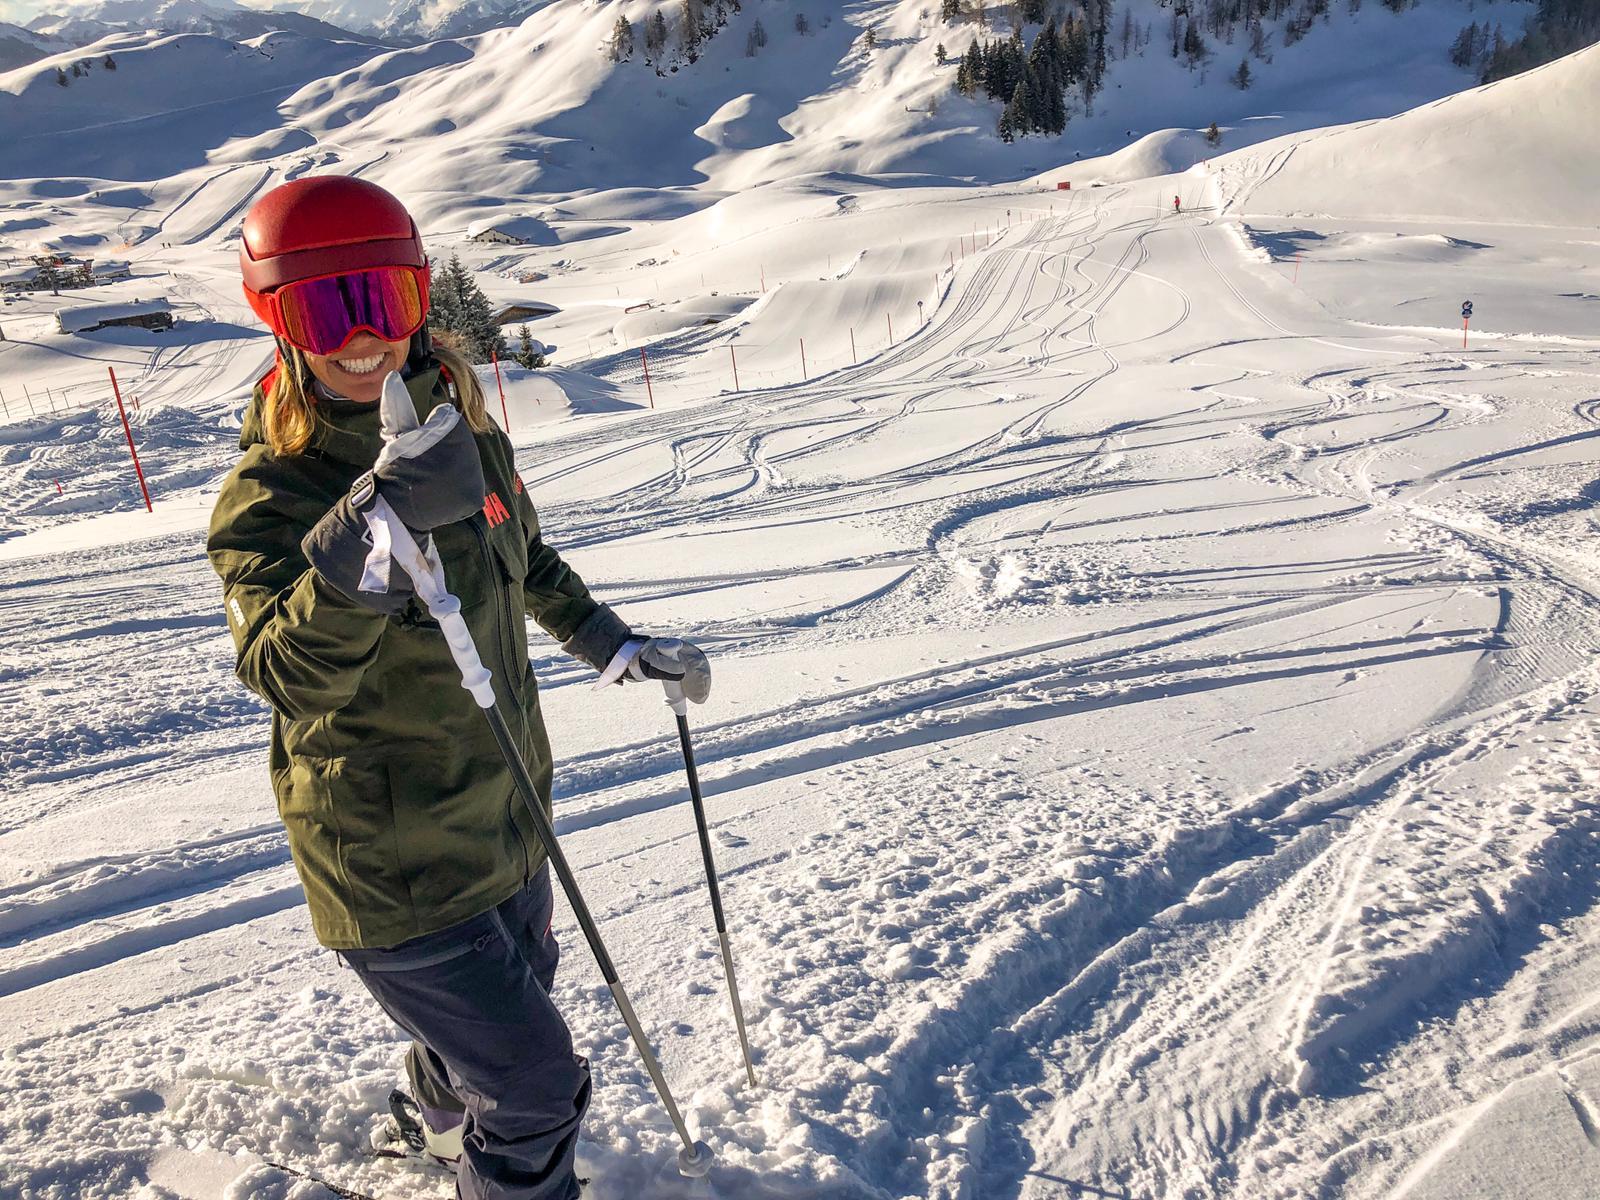 Miranda op de piste in Kitzbühel